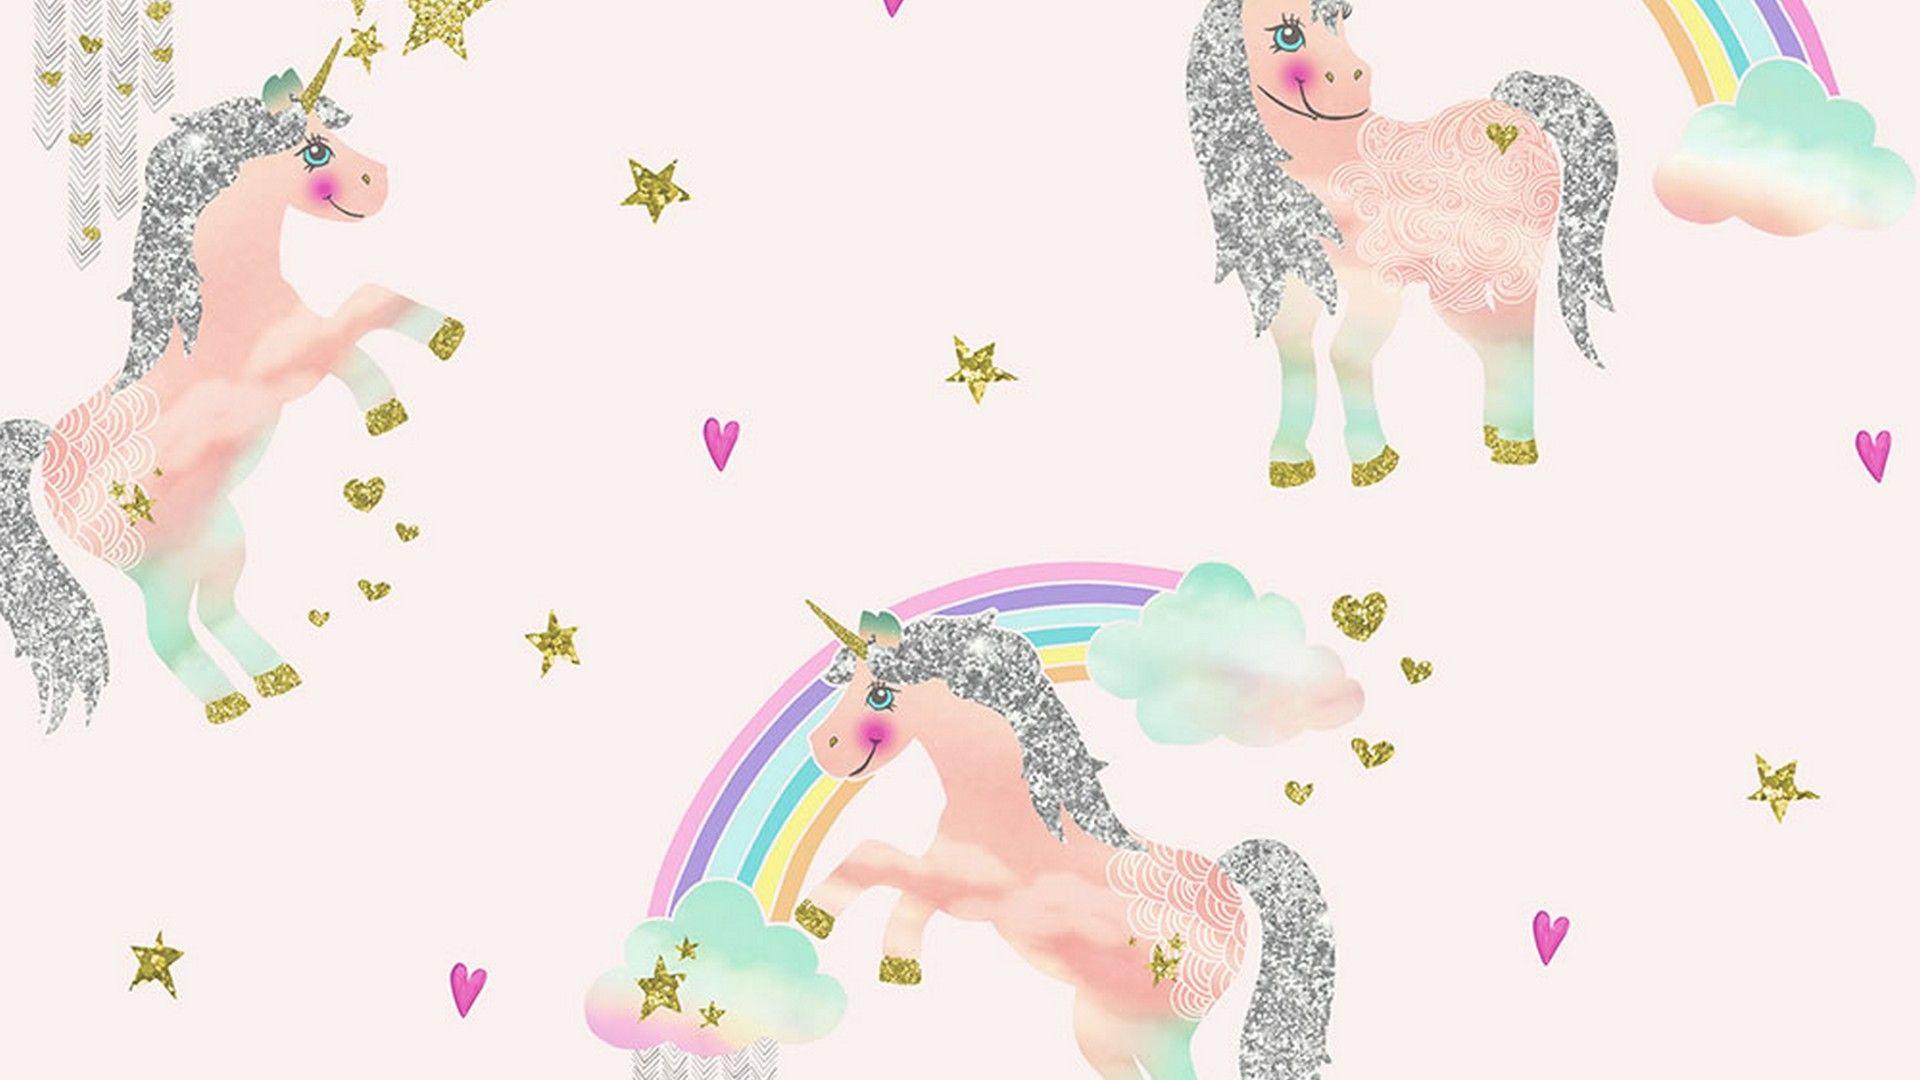 Cute Unicorn Desktop Backgrounds 2021 Live Wallpaper Hd Unicorn Wallpaper Glitter Wallpaper Unicorn And Glitter